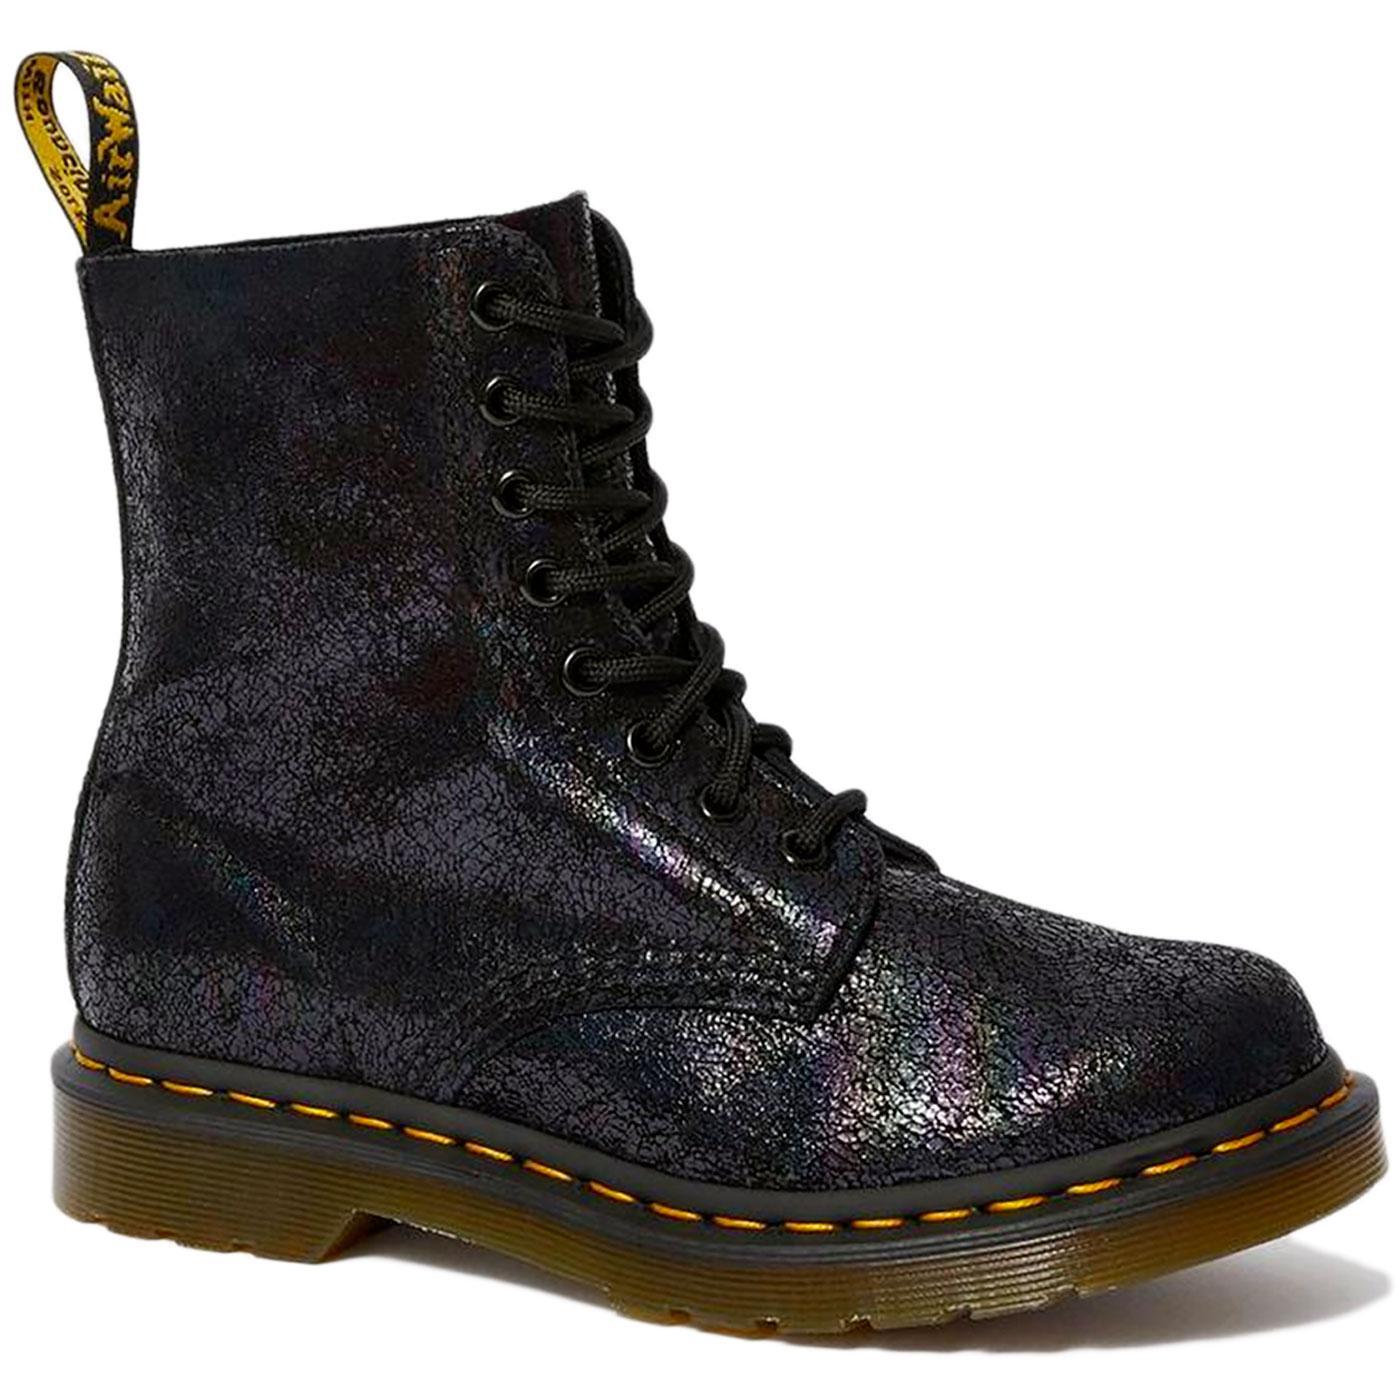 1460 Pascal Iridescent Crackle DR MARTENS Boots B